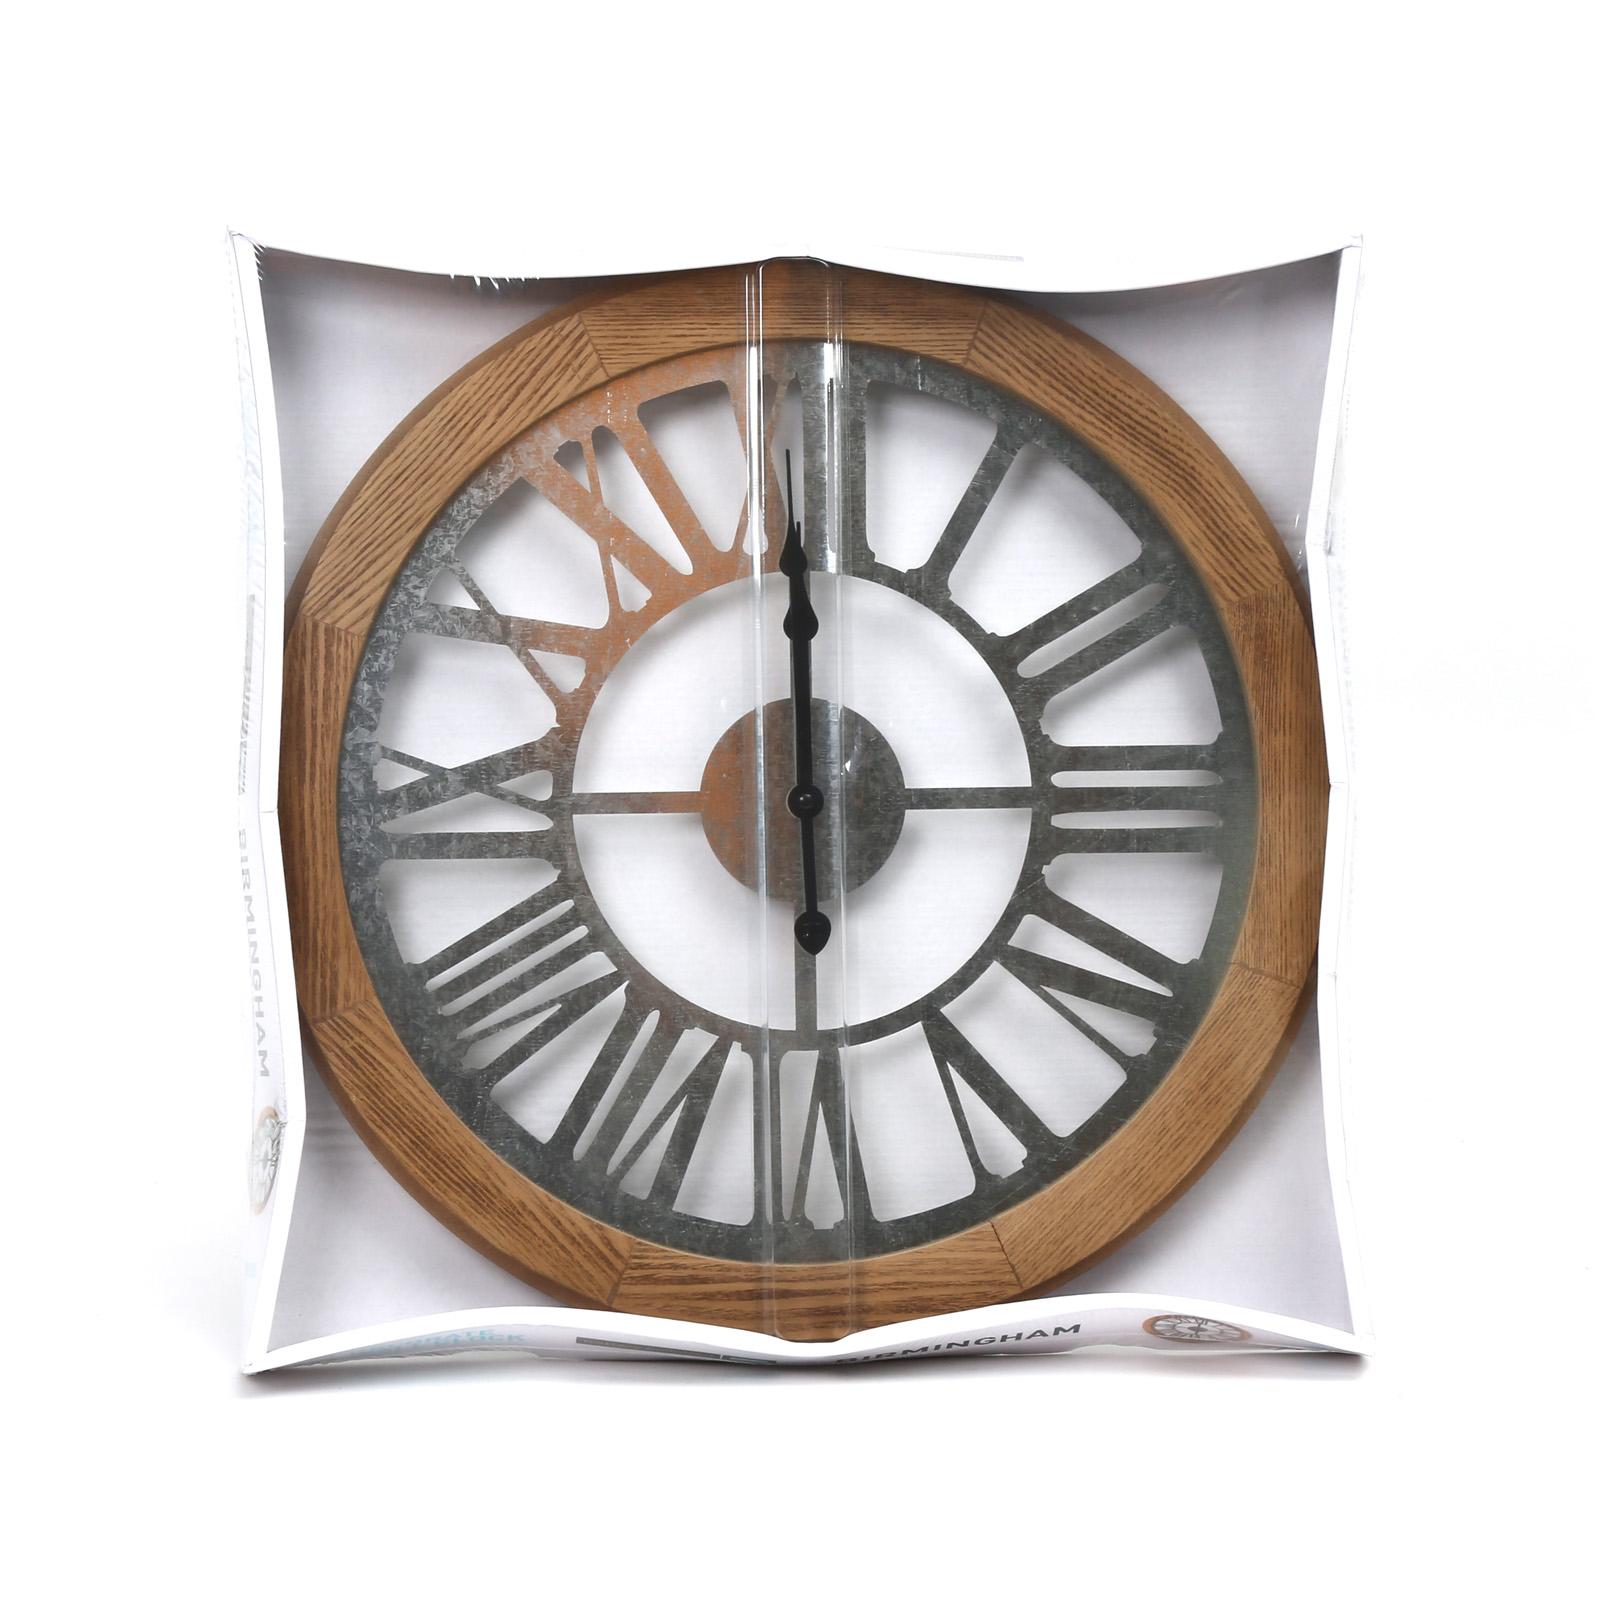 Platinet wand klok - Birmingham - 50 x 50 x 4,50 cm